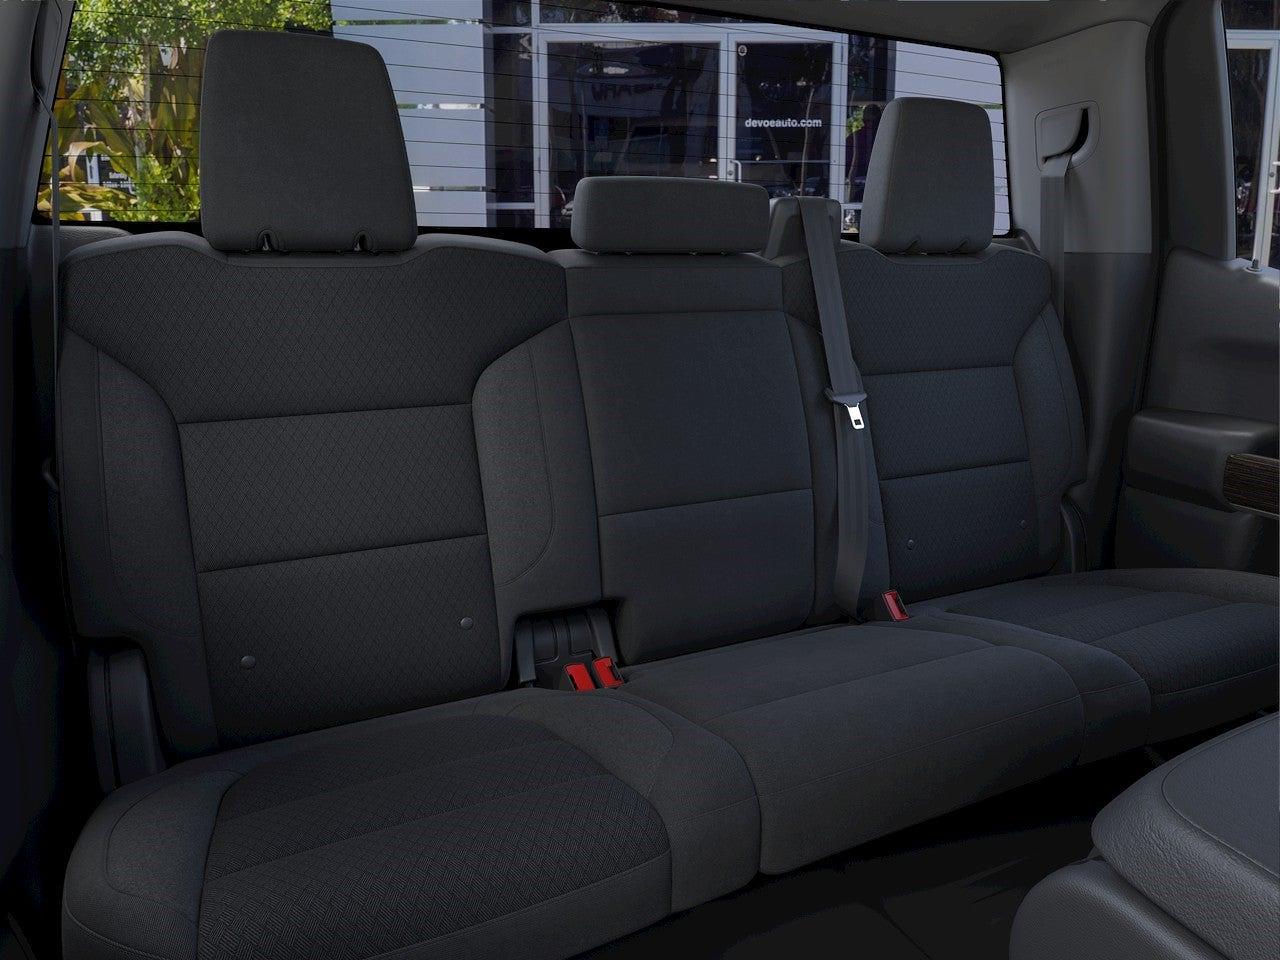 2021 GMC Sierra 1500 Double Cab 4x2, Pickup #T21316 - photo 16